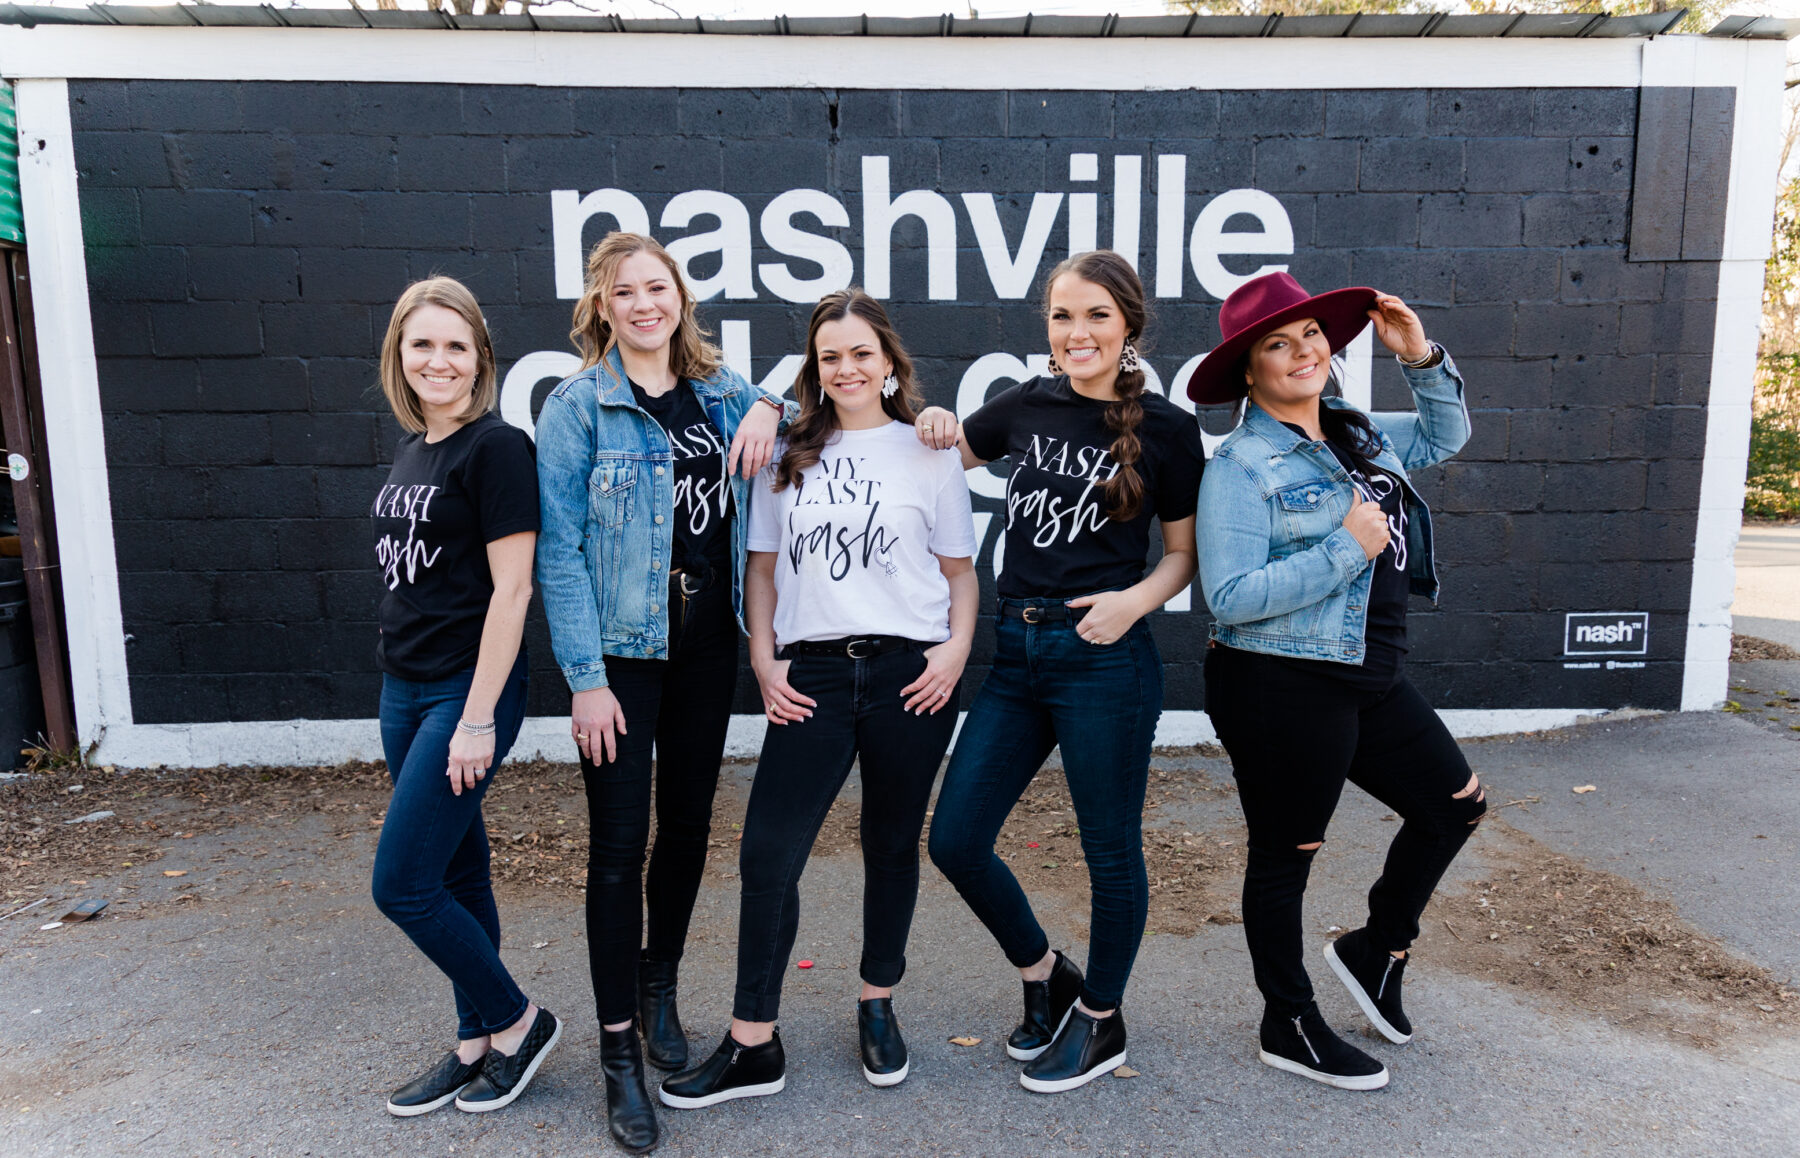 Meet Nash Bash Experiences: Photowalk Tours with a Professional Photographer